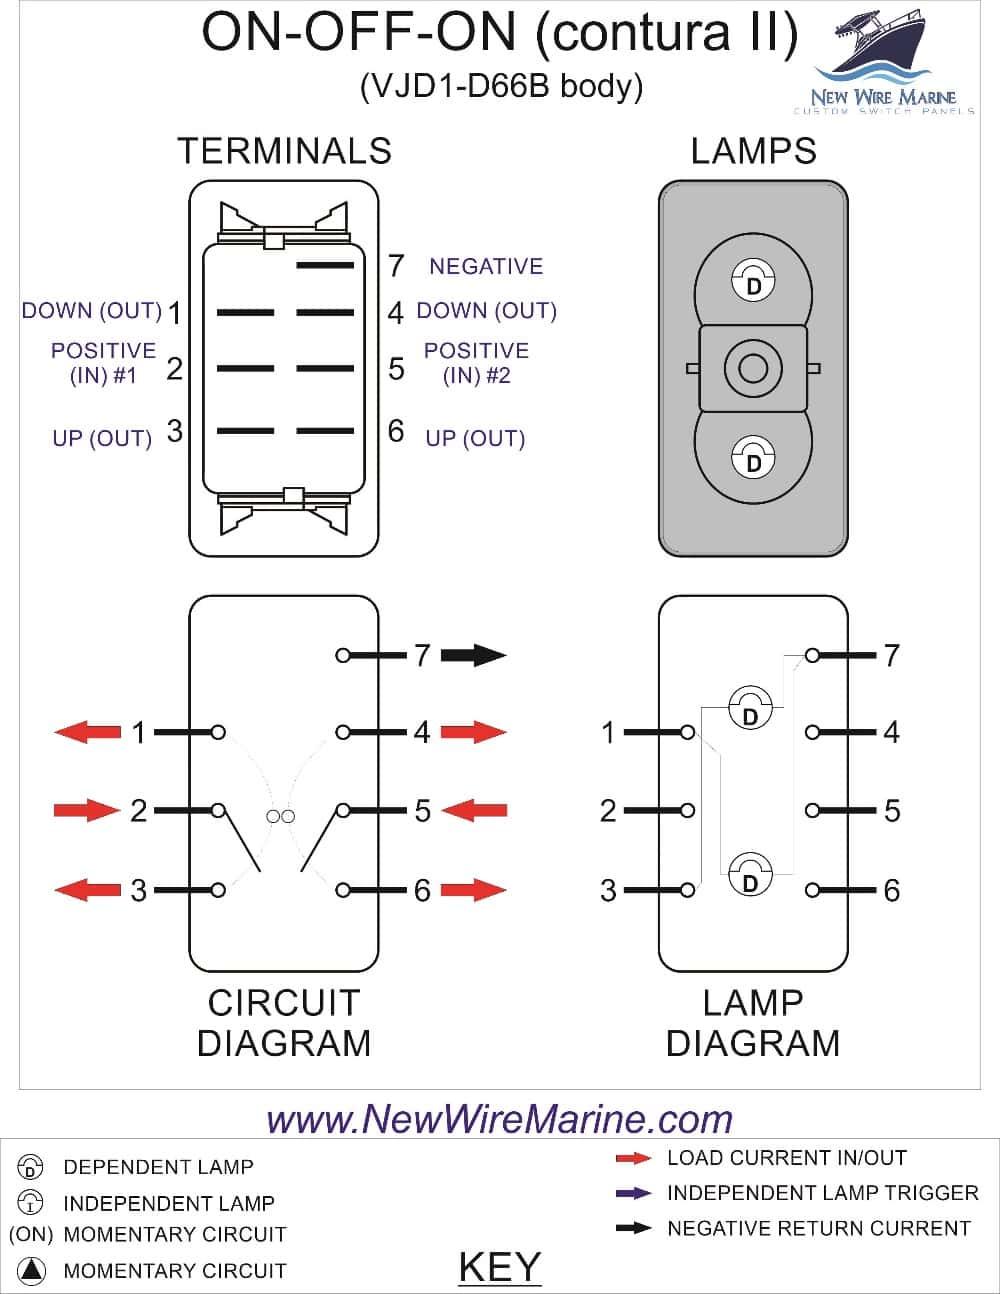 contura v rocker switches wiring diagram